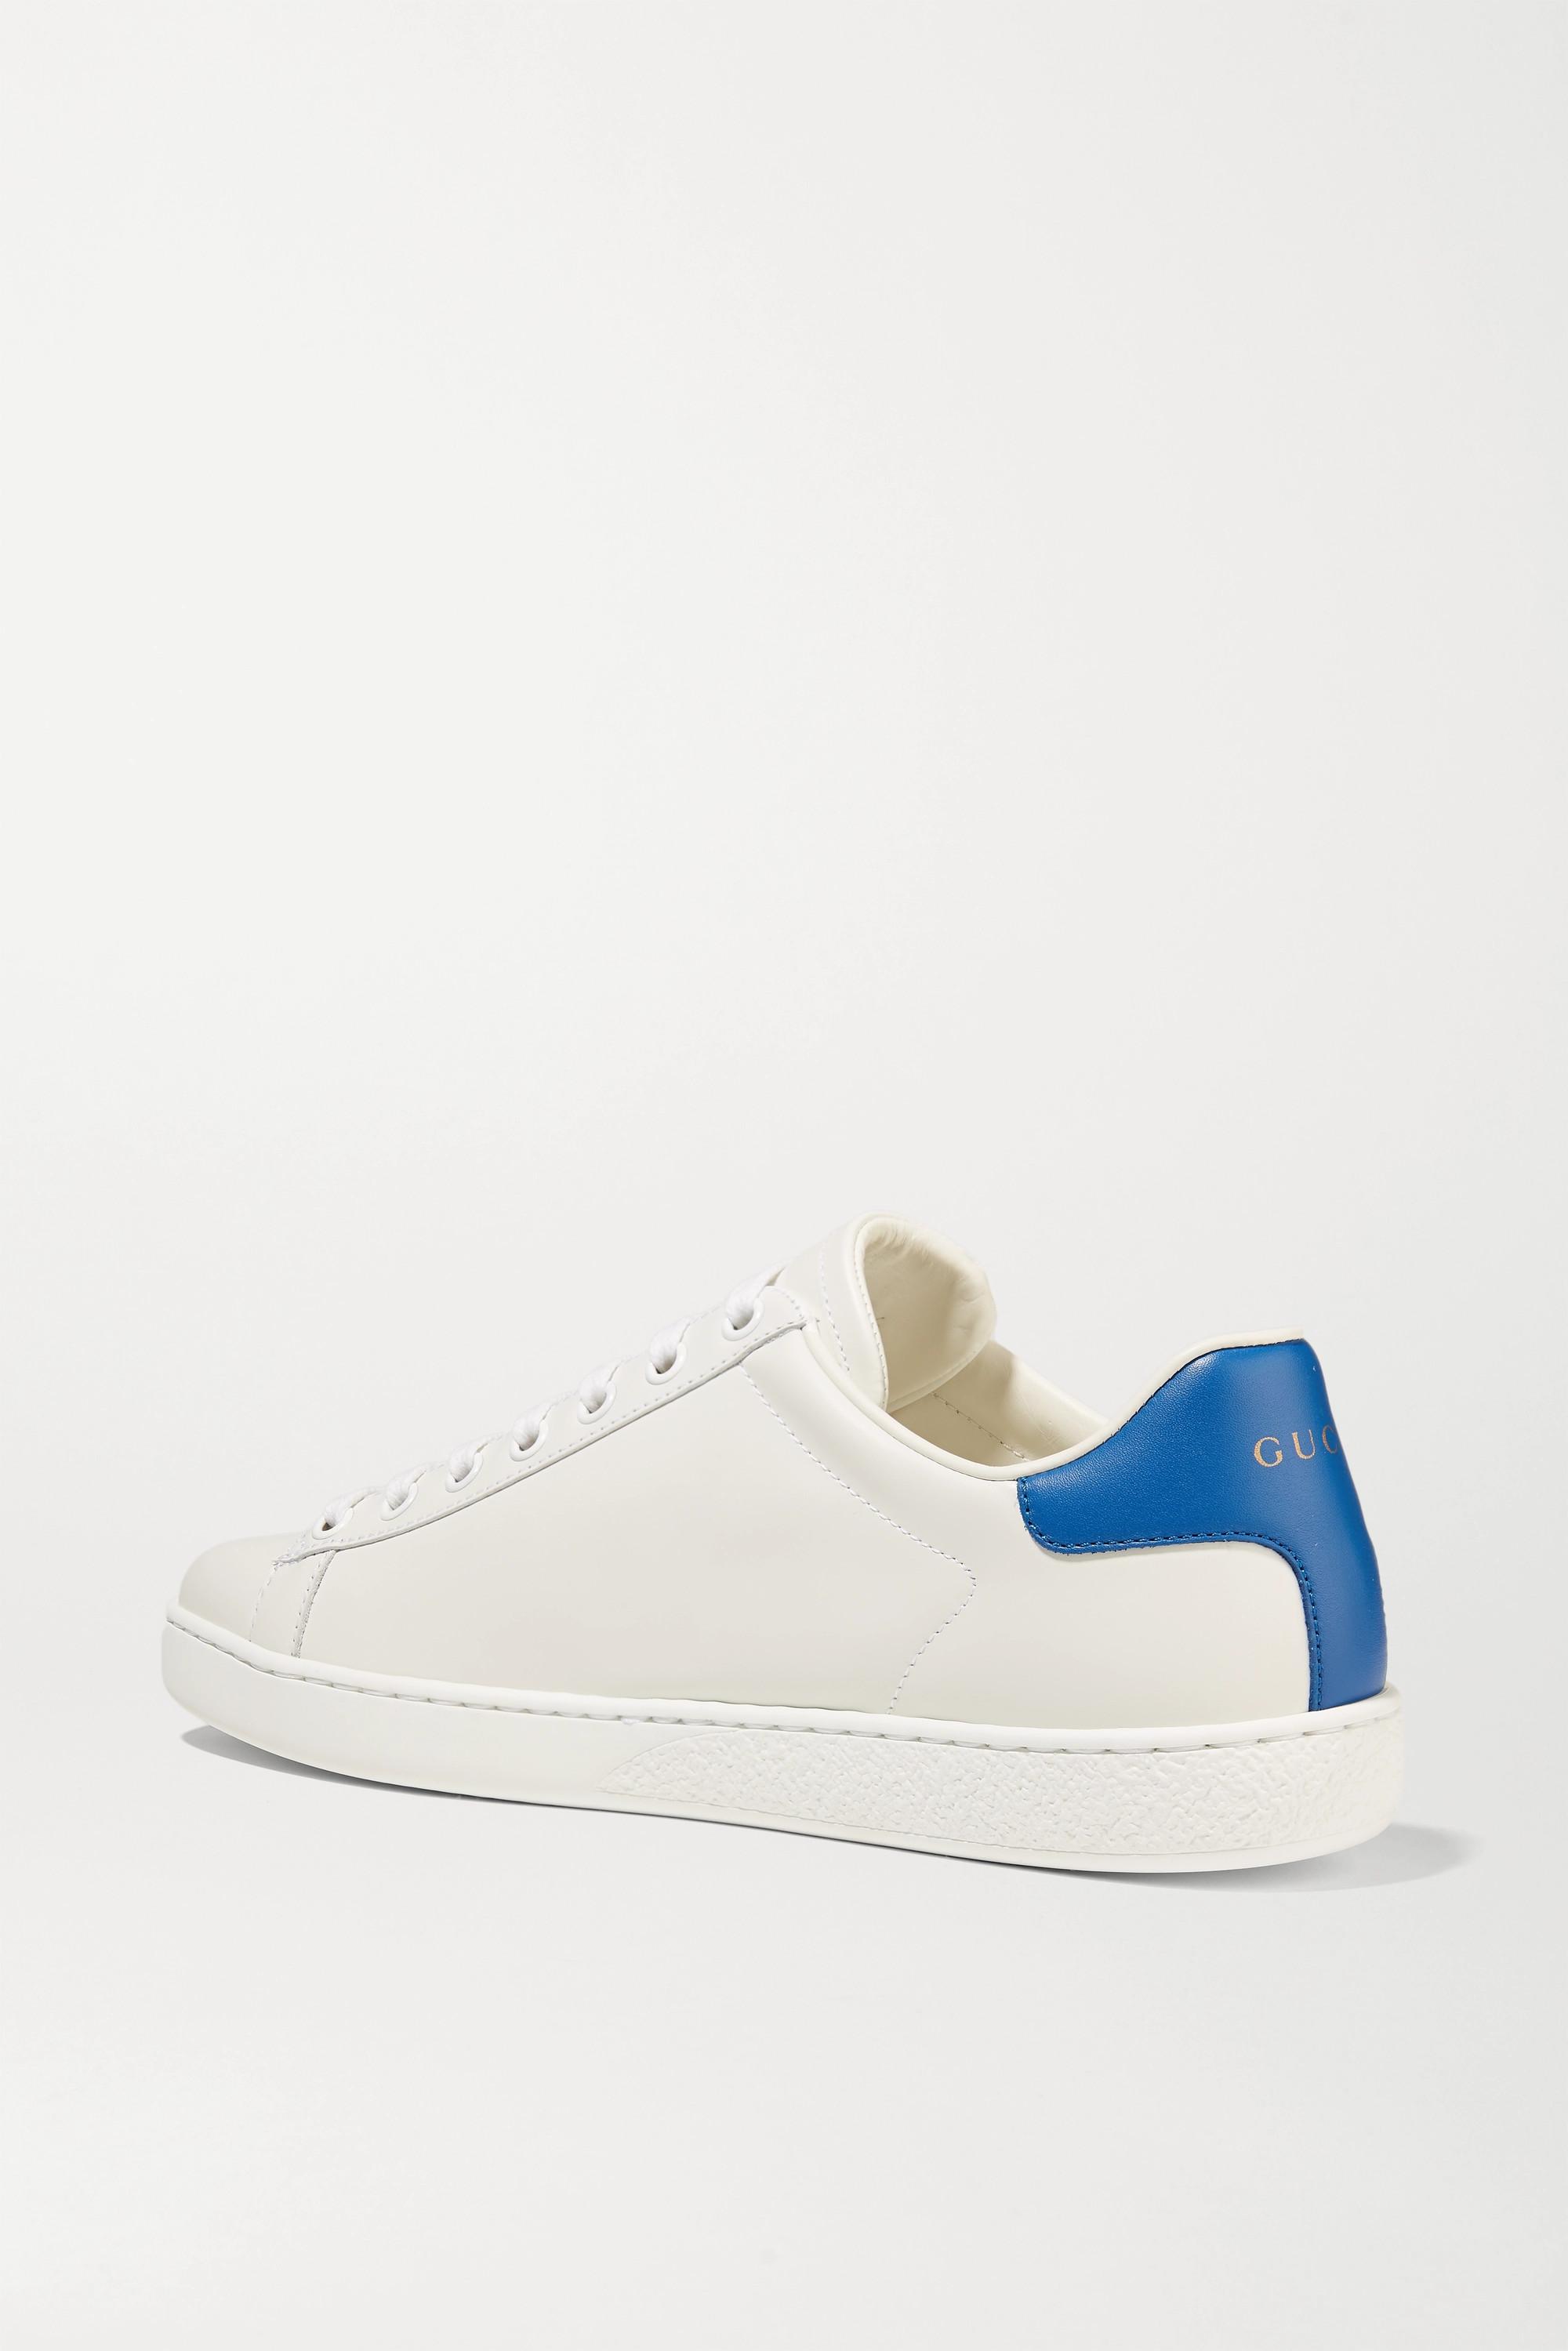 Gucci Ace 刺绣皮革运动鞋